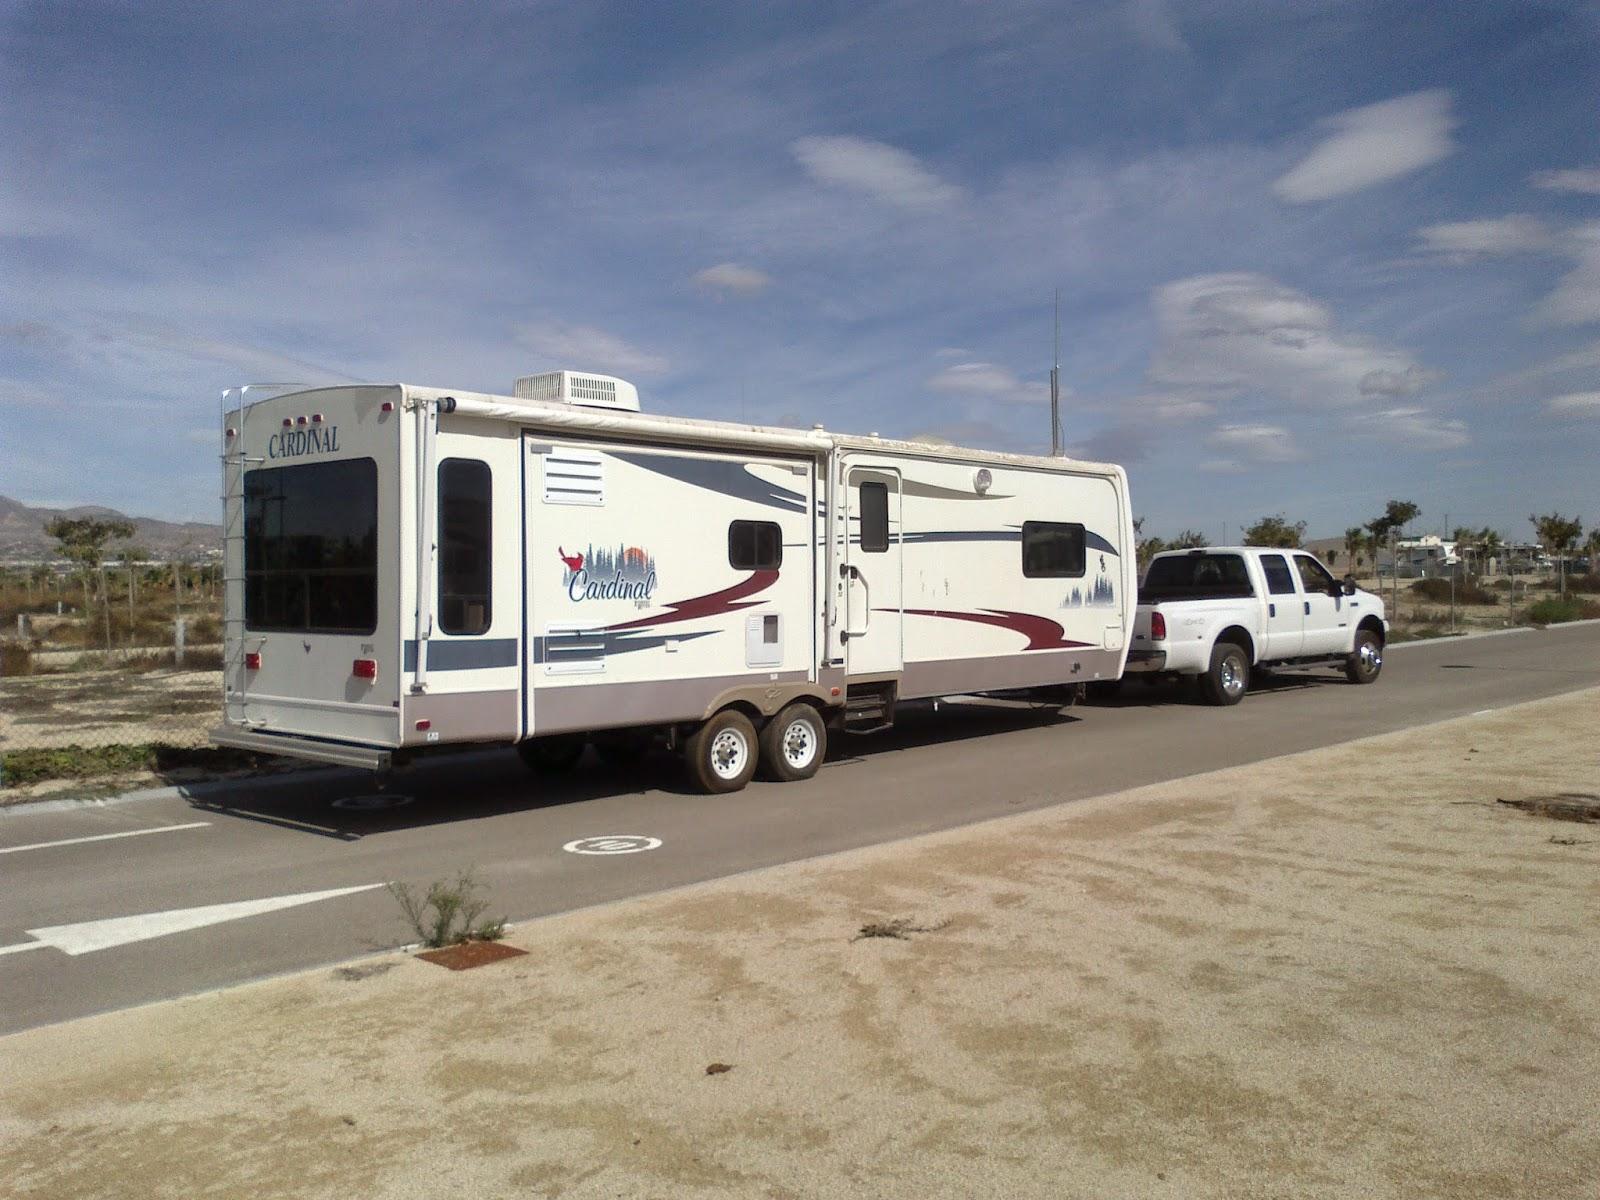 American caravan towing